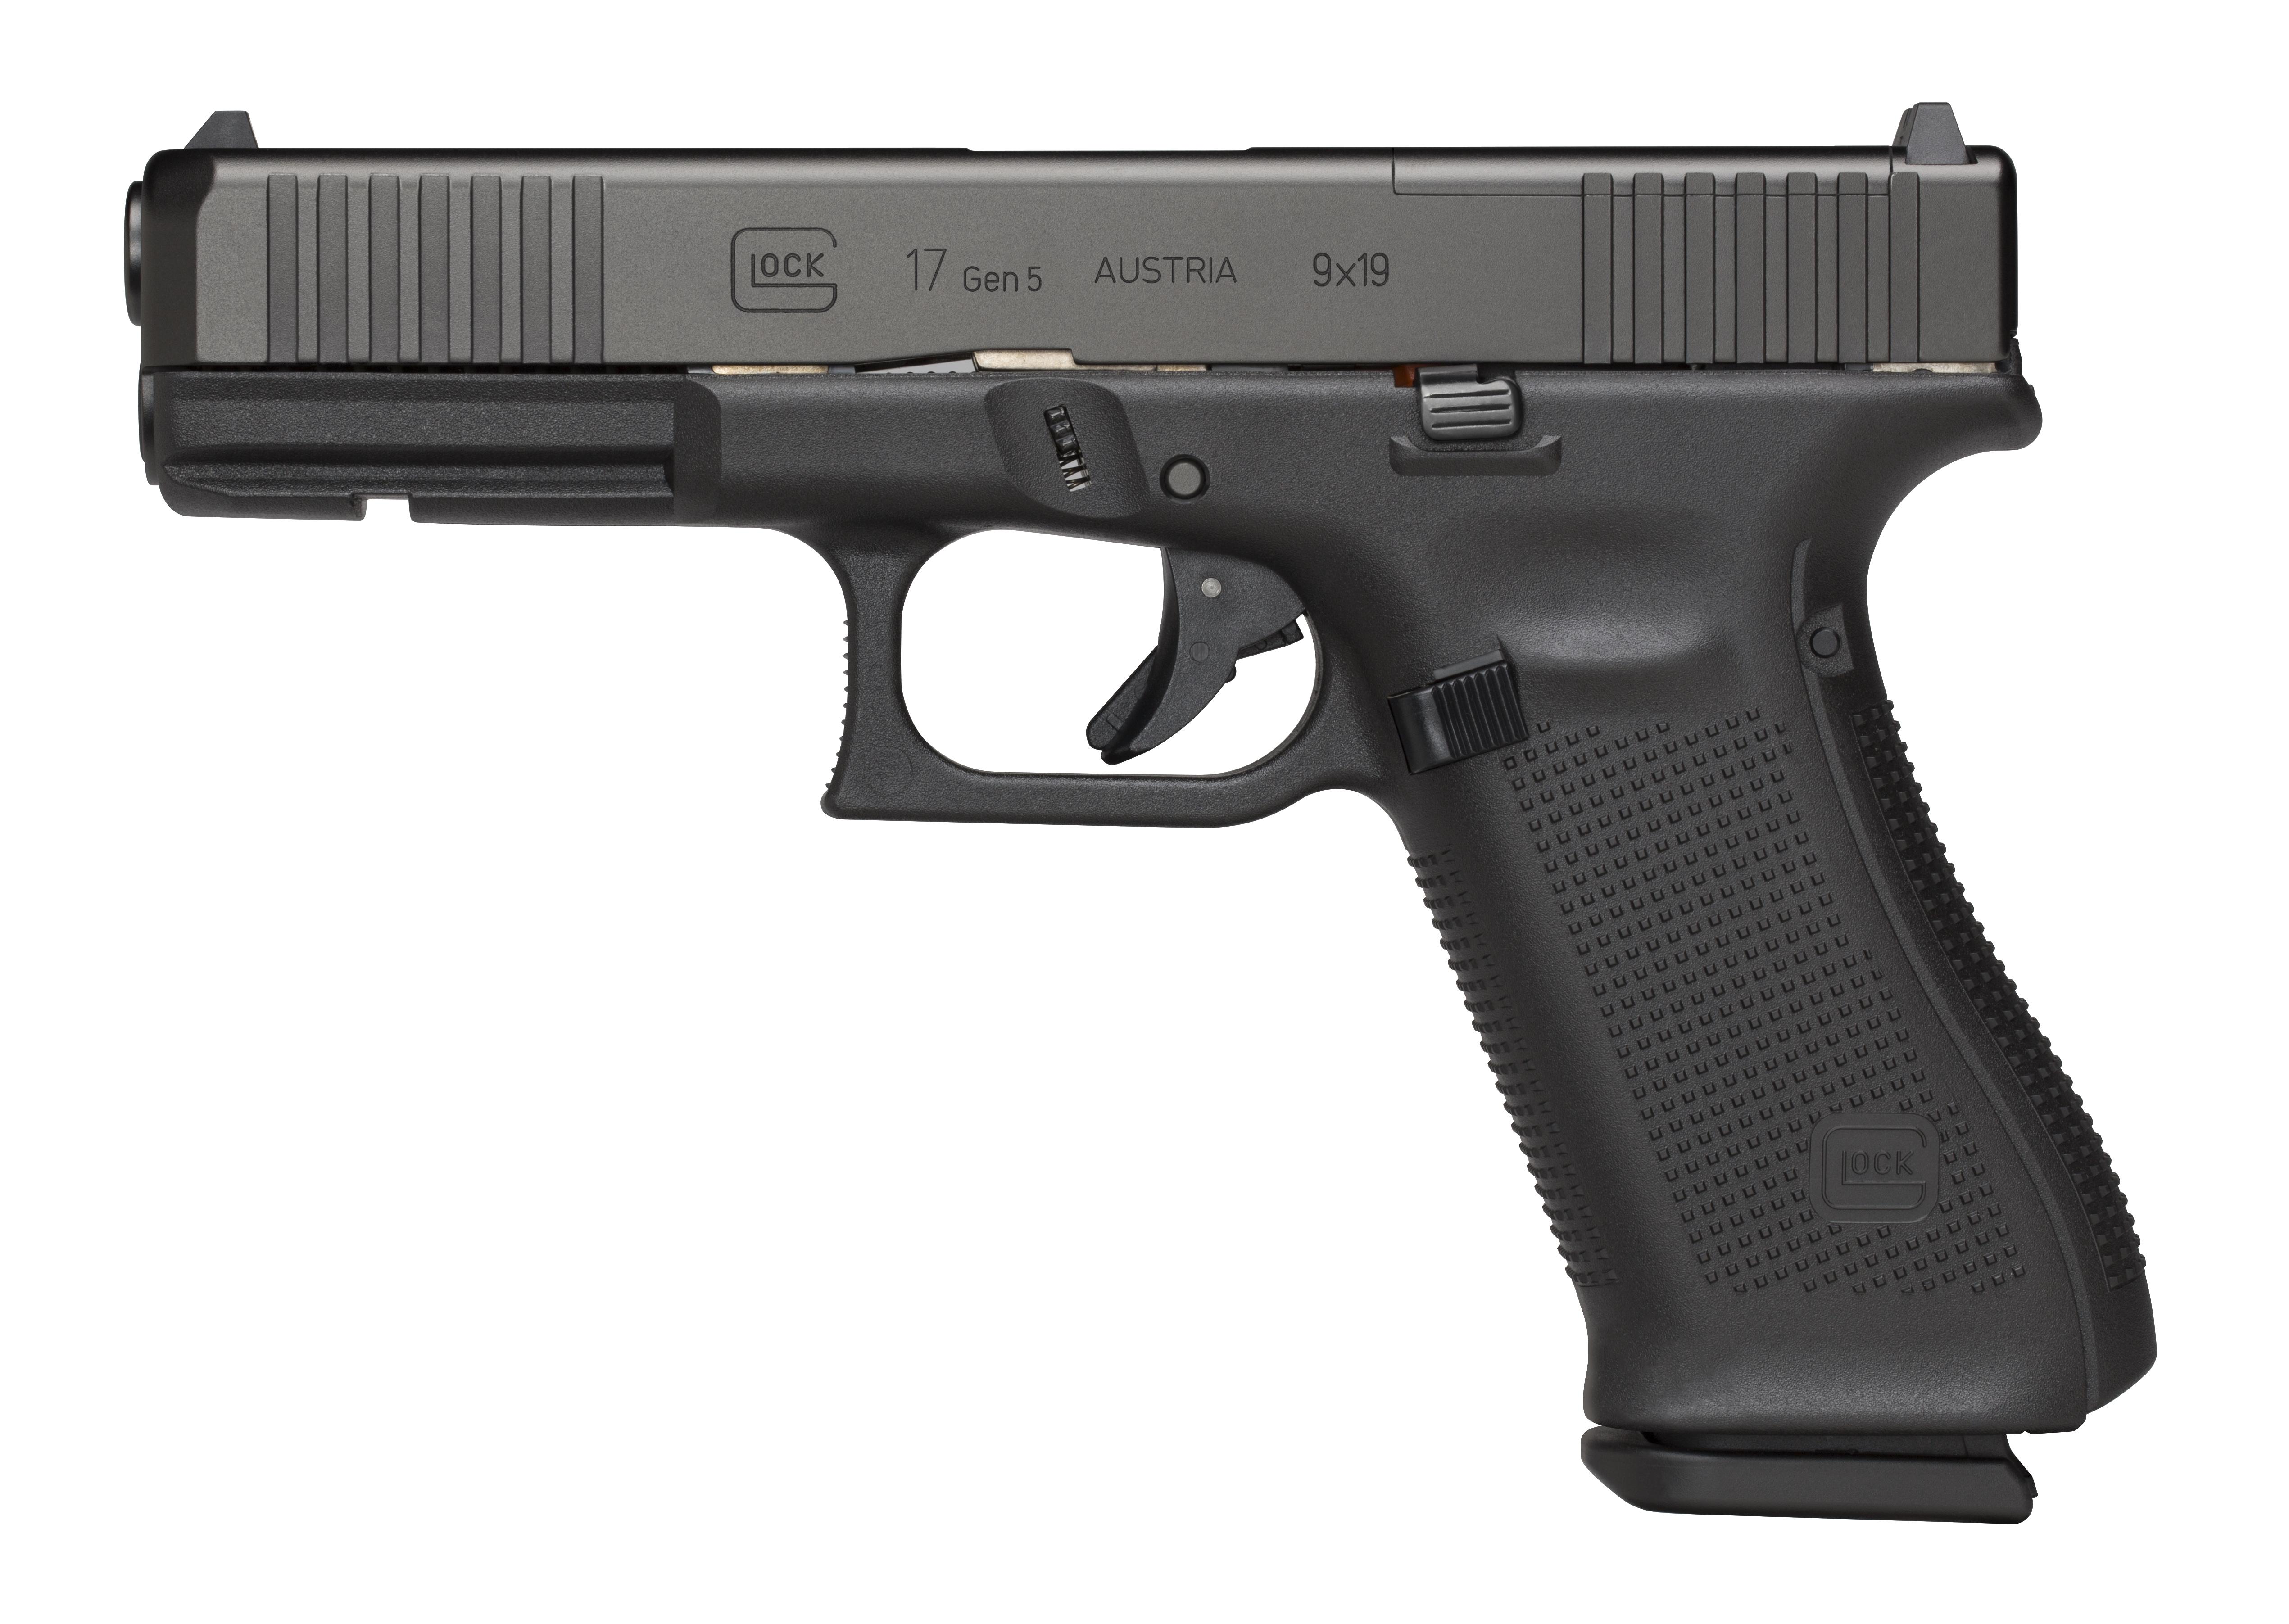 GLOCK G17 G5 MOS 9mm